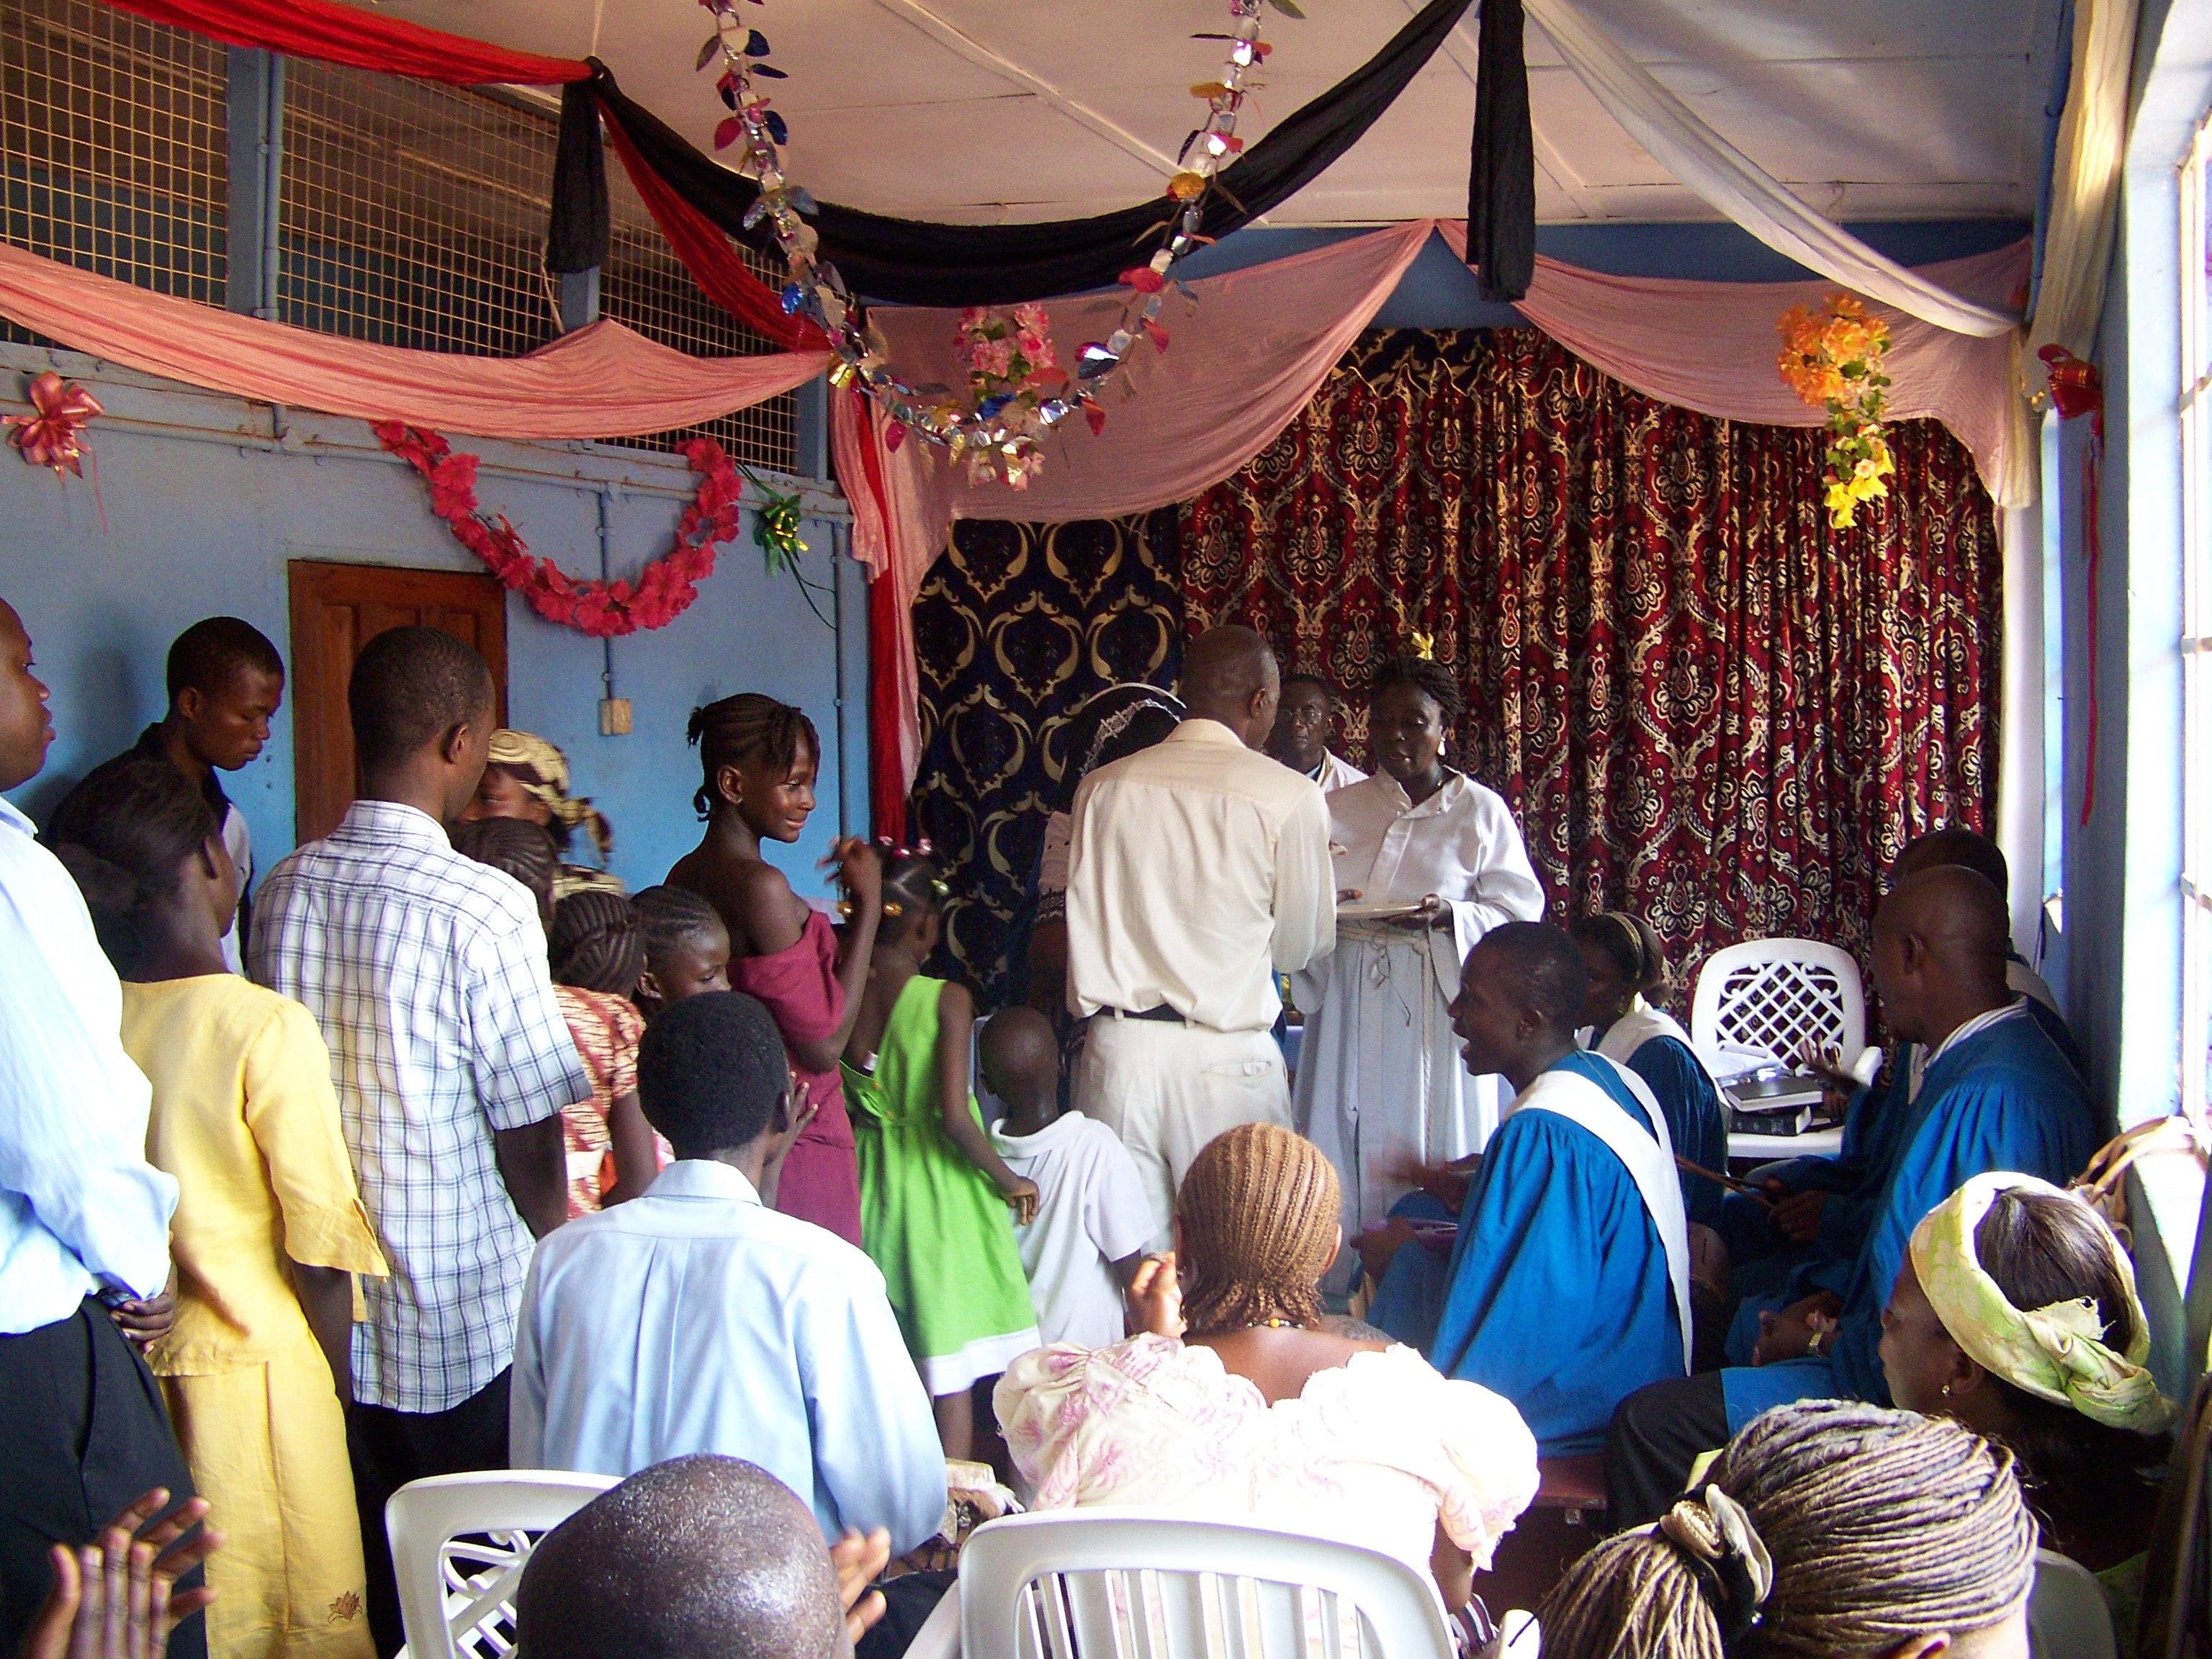 King of Kings Lutheran Church | On mission Sierra Leone Blog